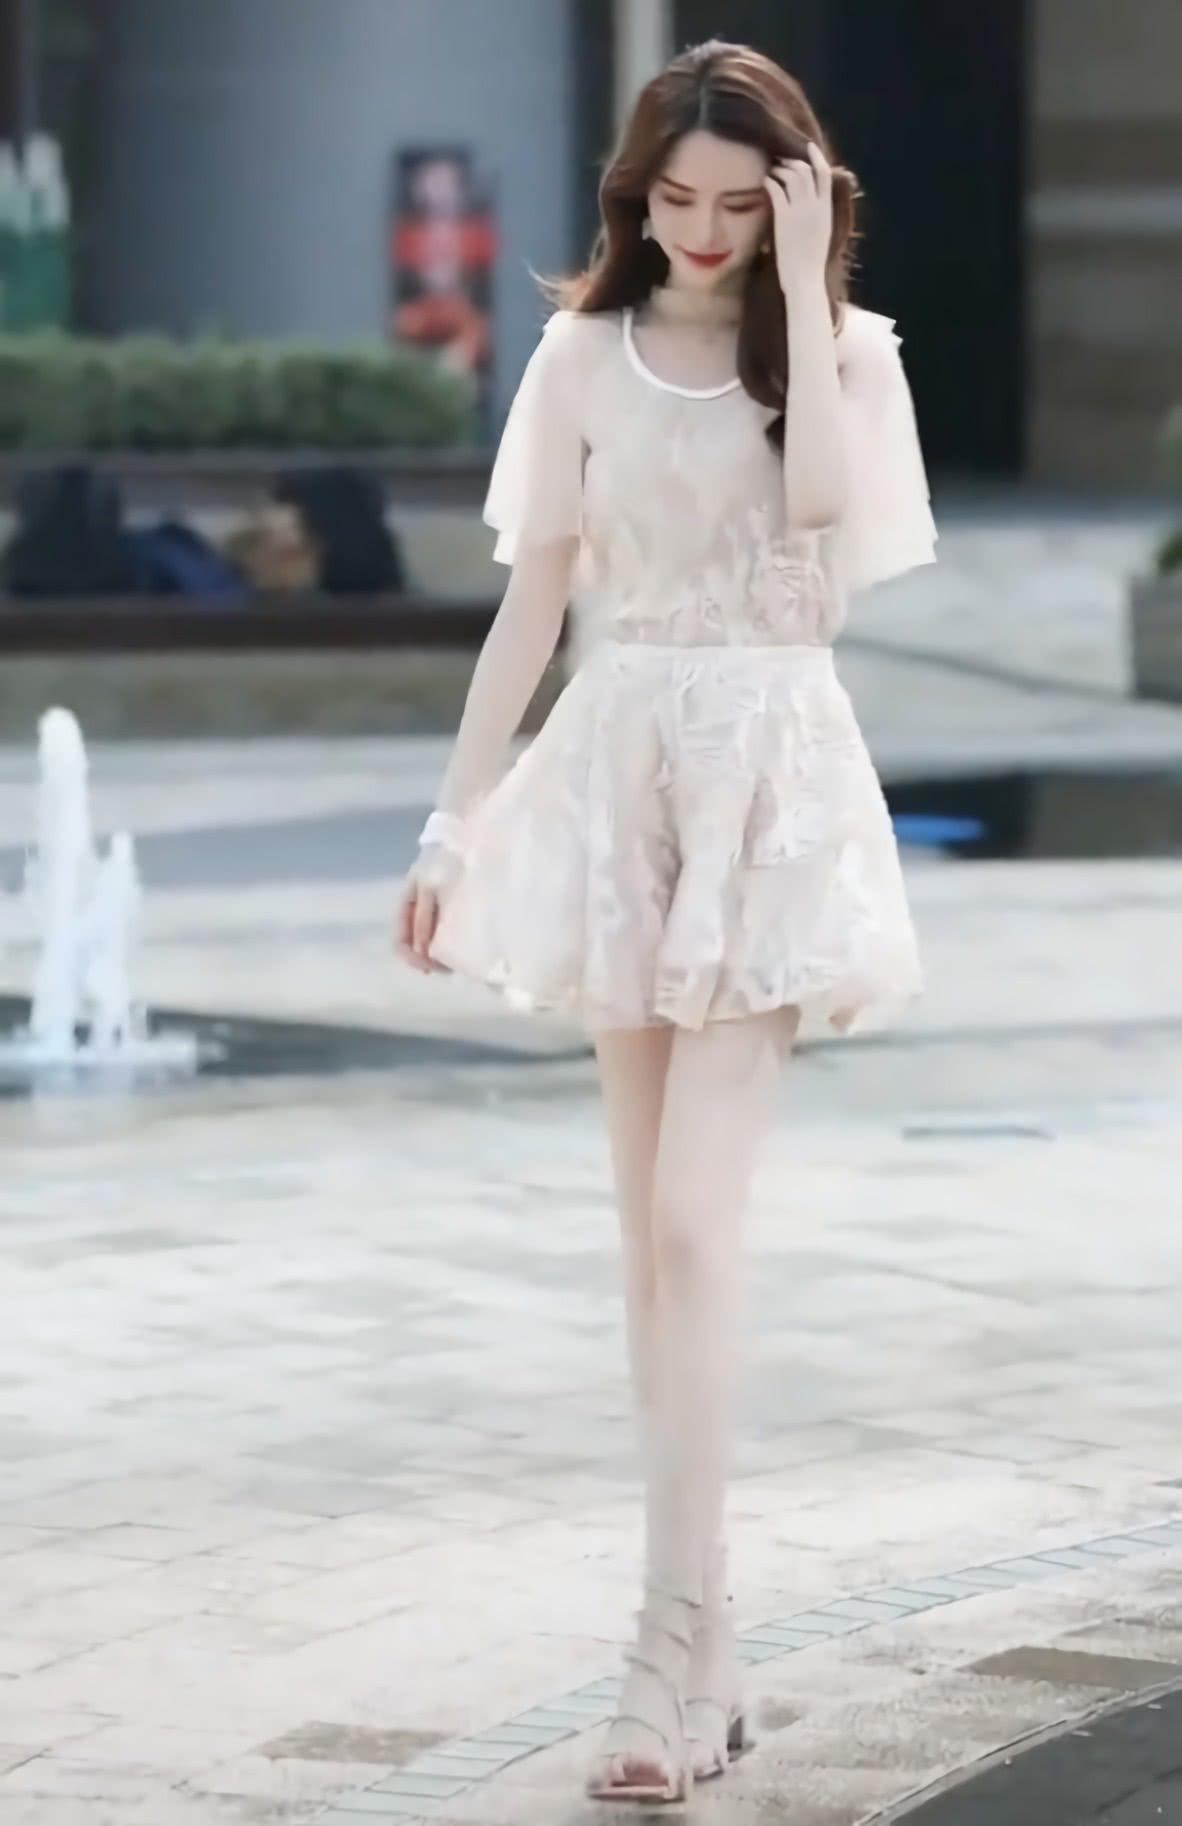 "<b>建议:女生一定要试试""弹簧凉鞋"",妹子穿后腿比脸还白,爱了!</b>"